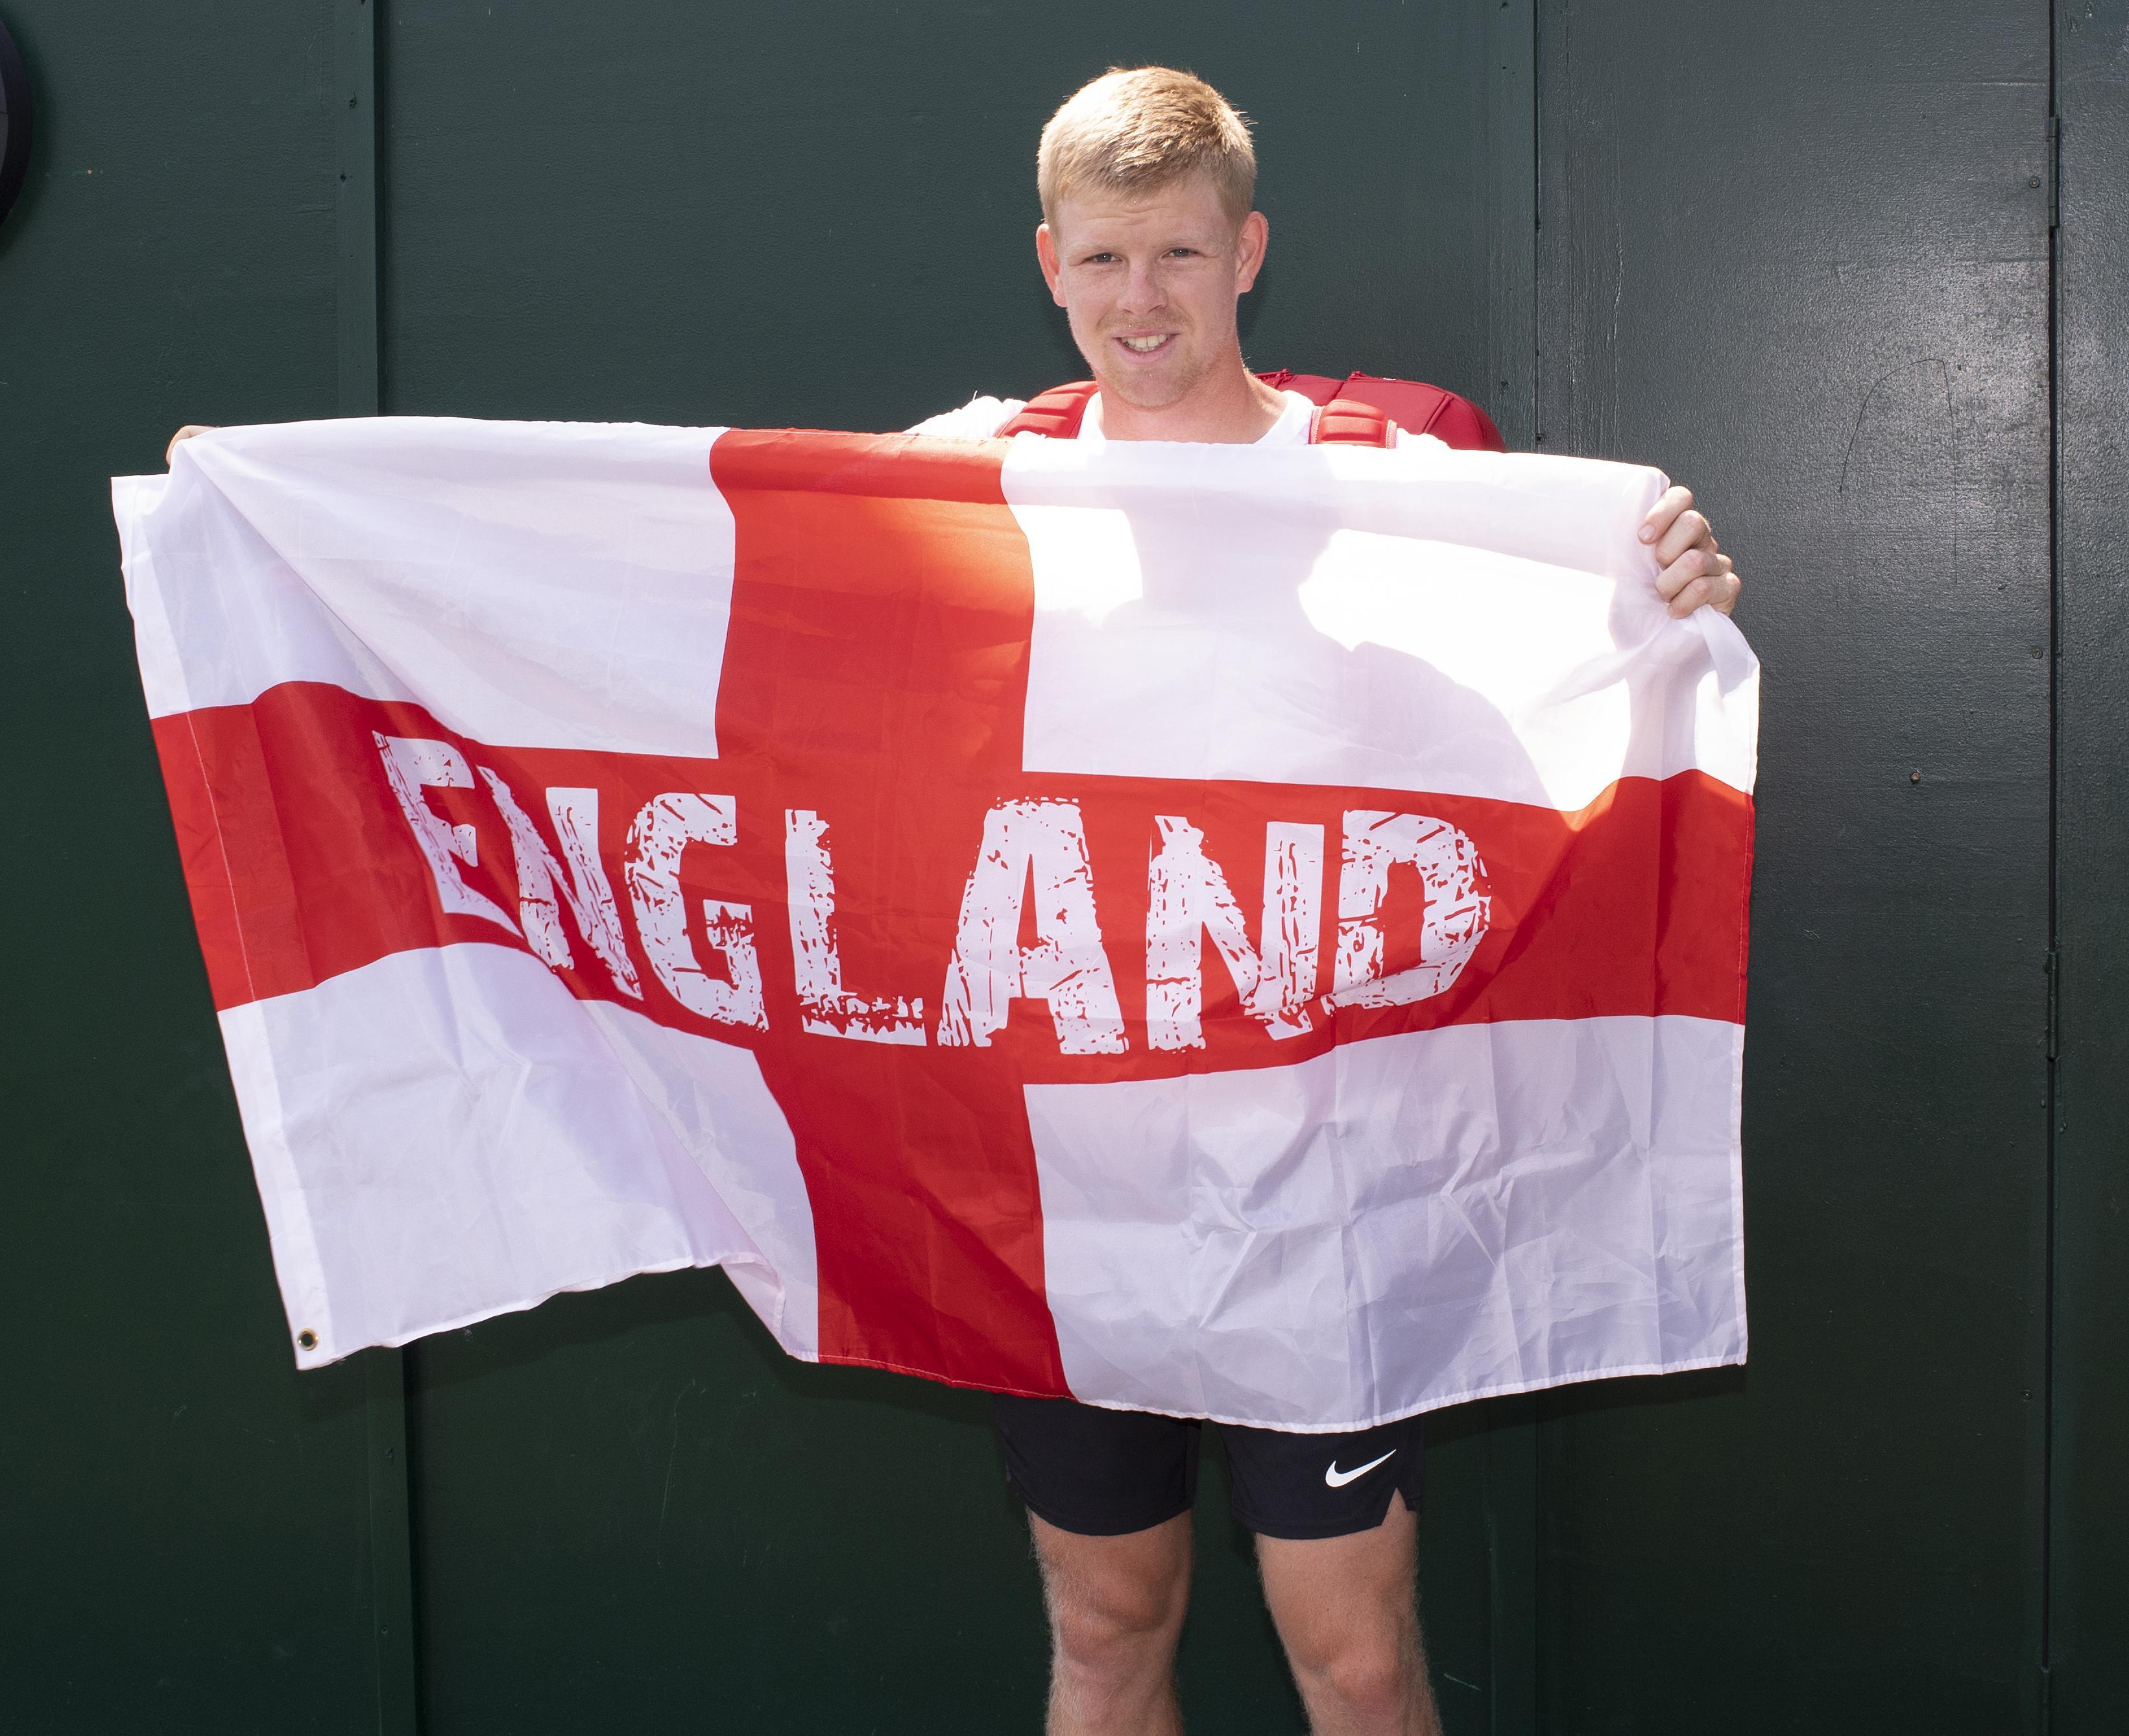 British No1 Kyle Edmund poses proudly with his England flag as he prepares to play Djokovic